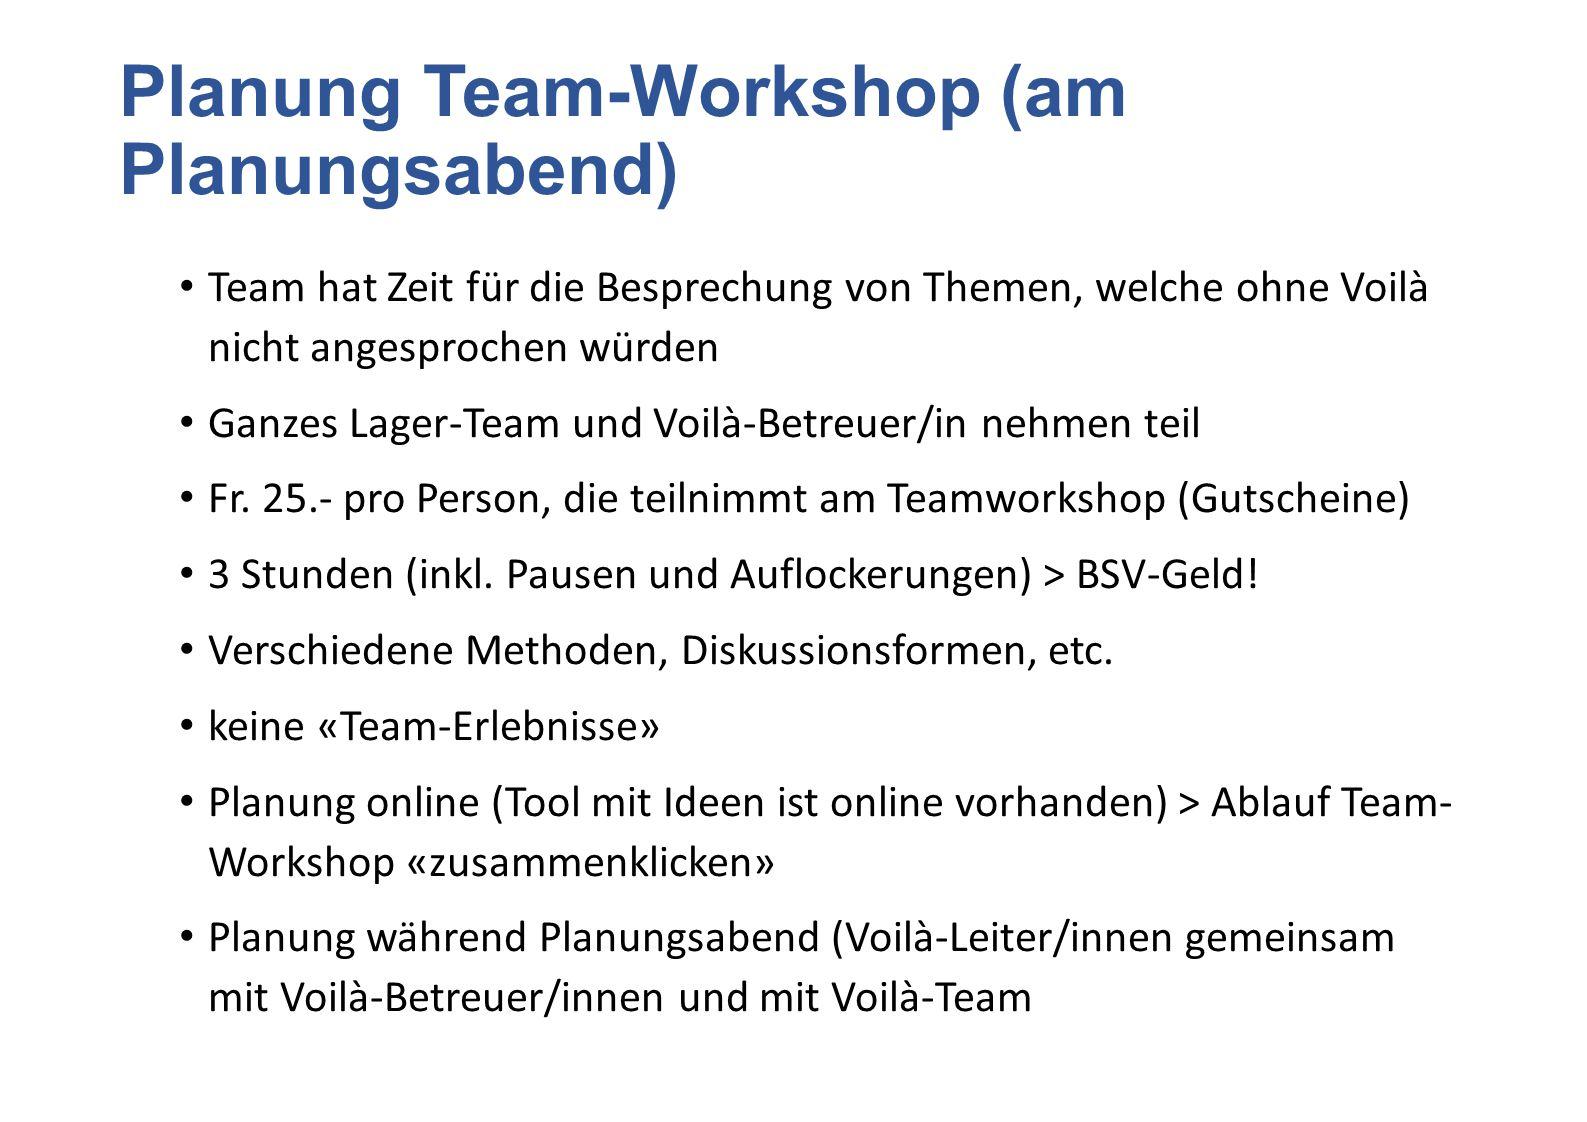 Planung Team-Workshop (am Planungsabend)